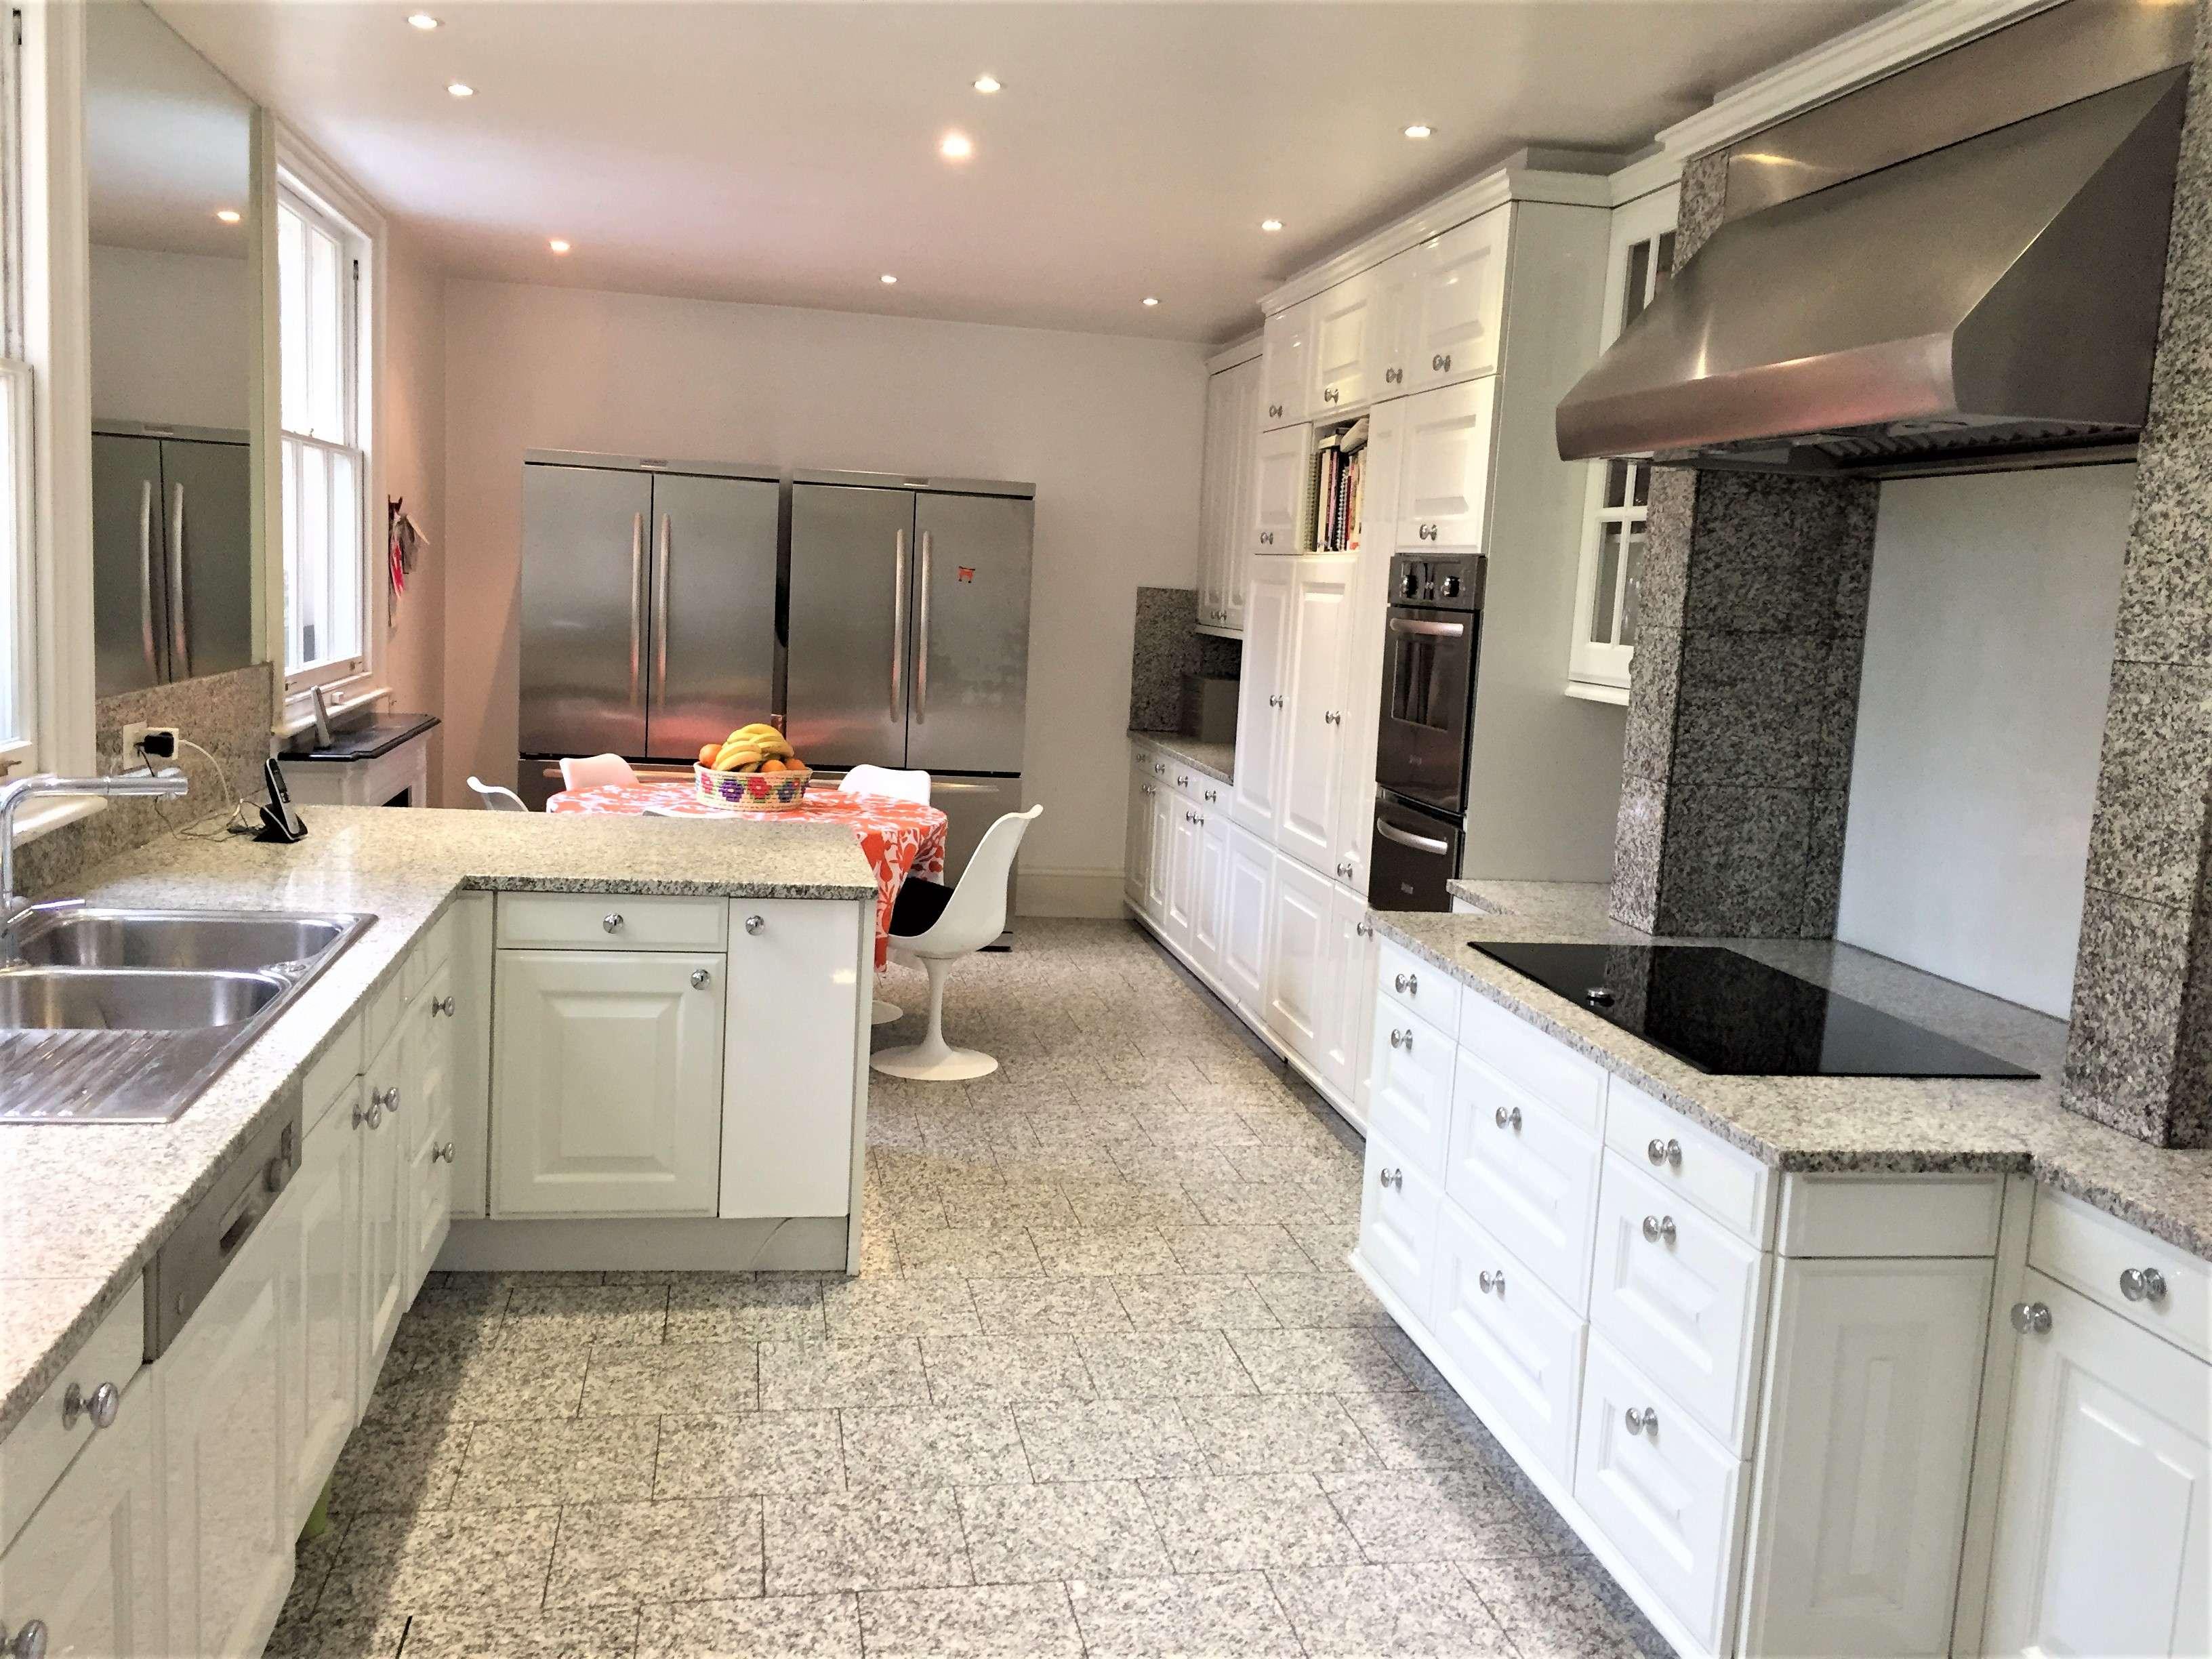 Large Siematic Shaker Kitchen White Gloss, Lots of Appliances & Granite  Worktops 1218498